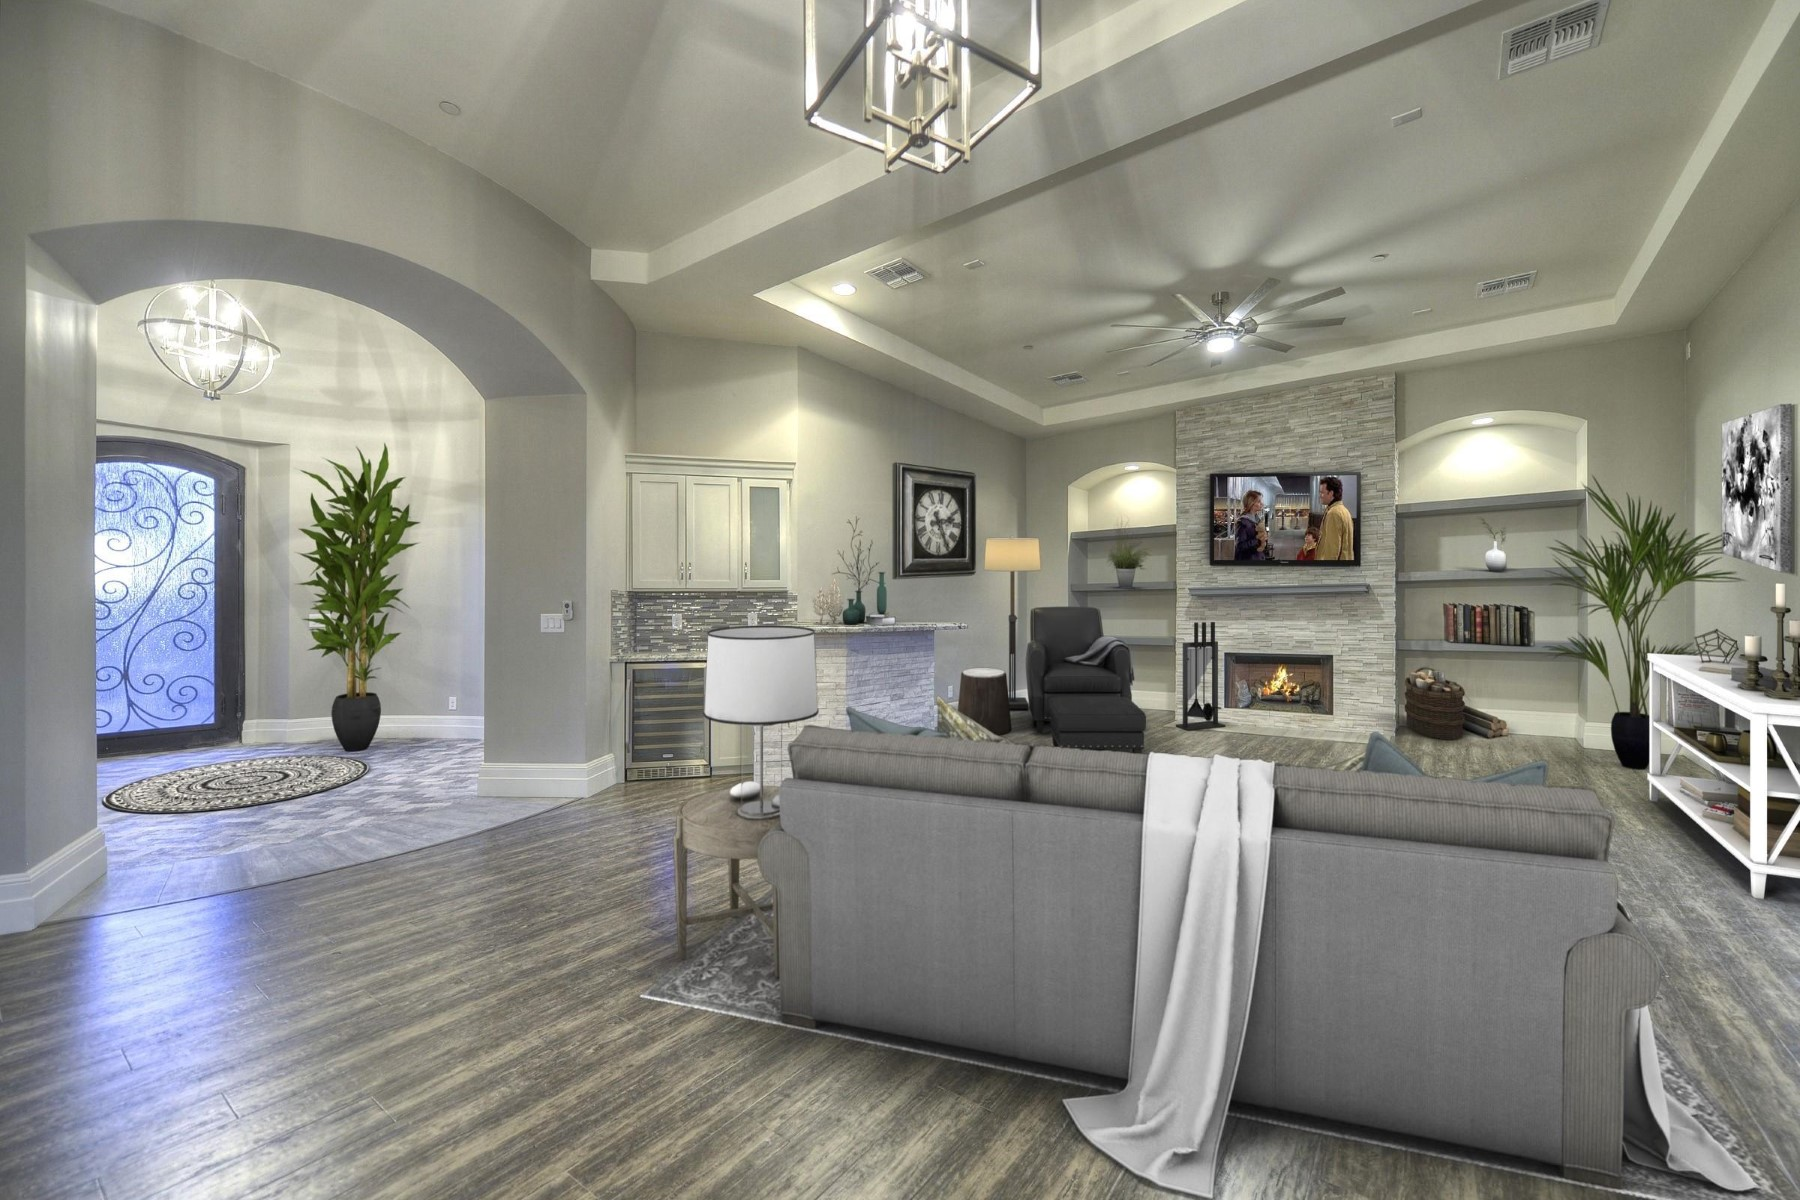 独户住宅 为 销售 在 One of a kind 2017 custom private one story home 8709 E Villa Cassandra Dr, 斯科茨代尔, 亚利桑那州, 85266 美国